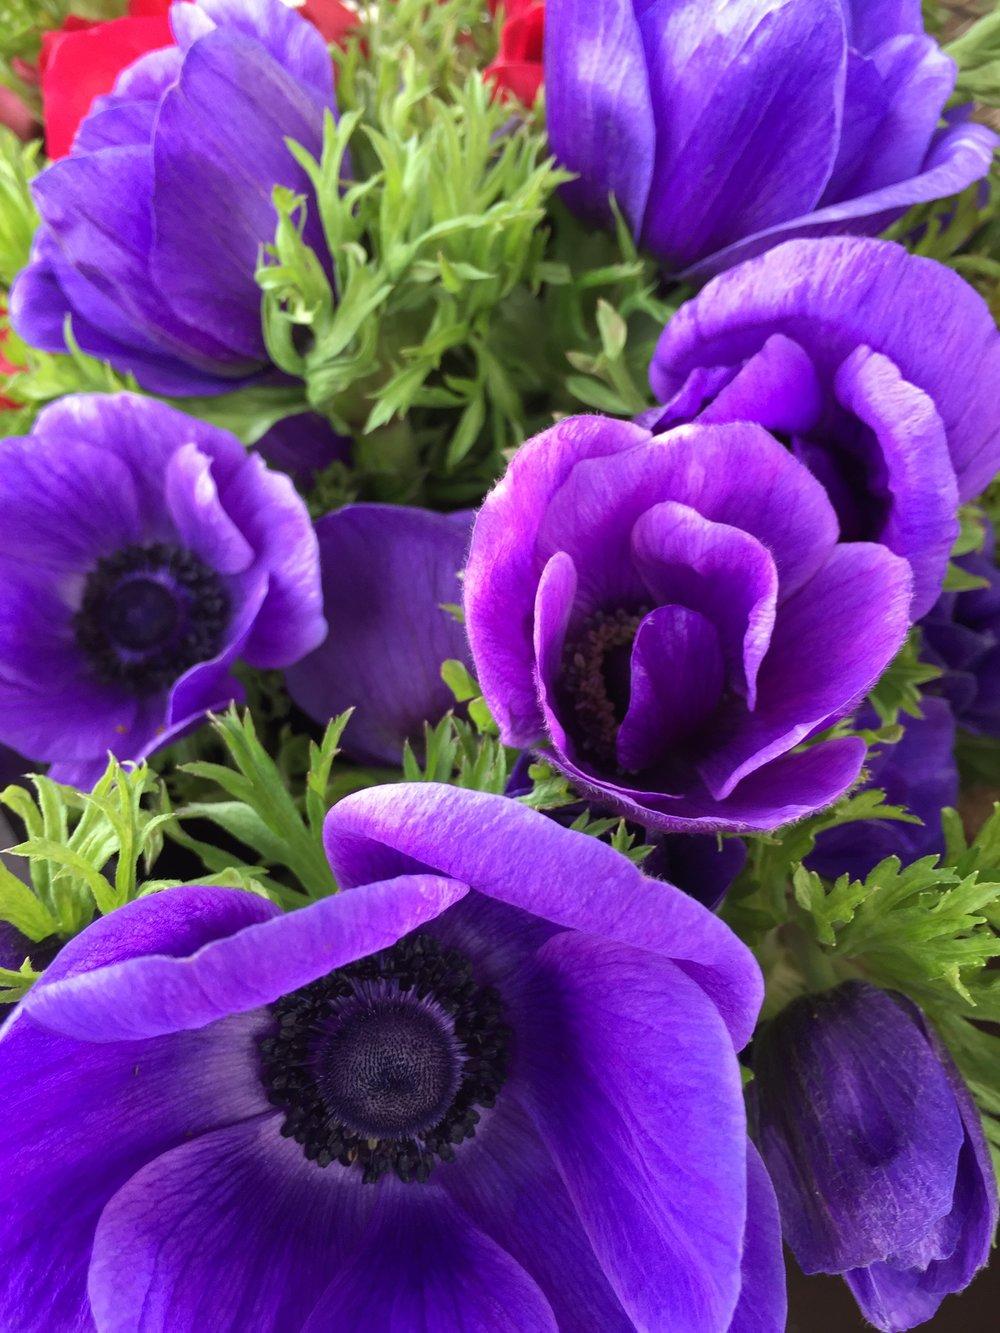 grey winter, purple anemones